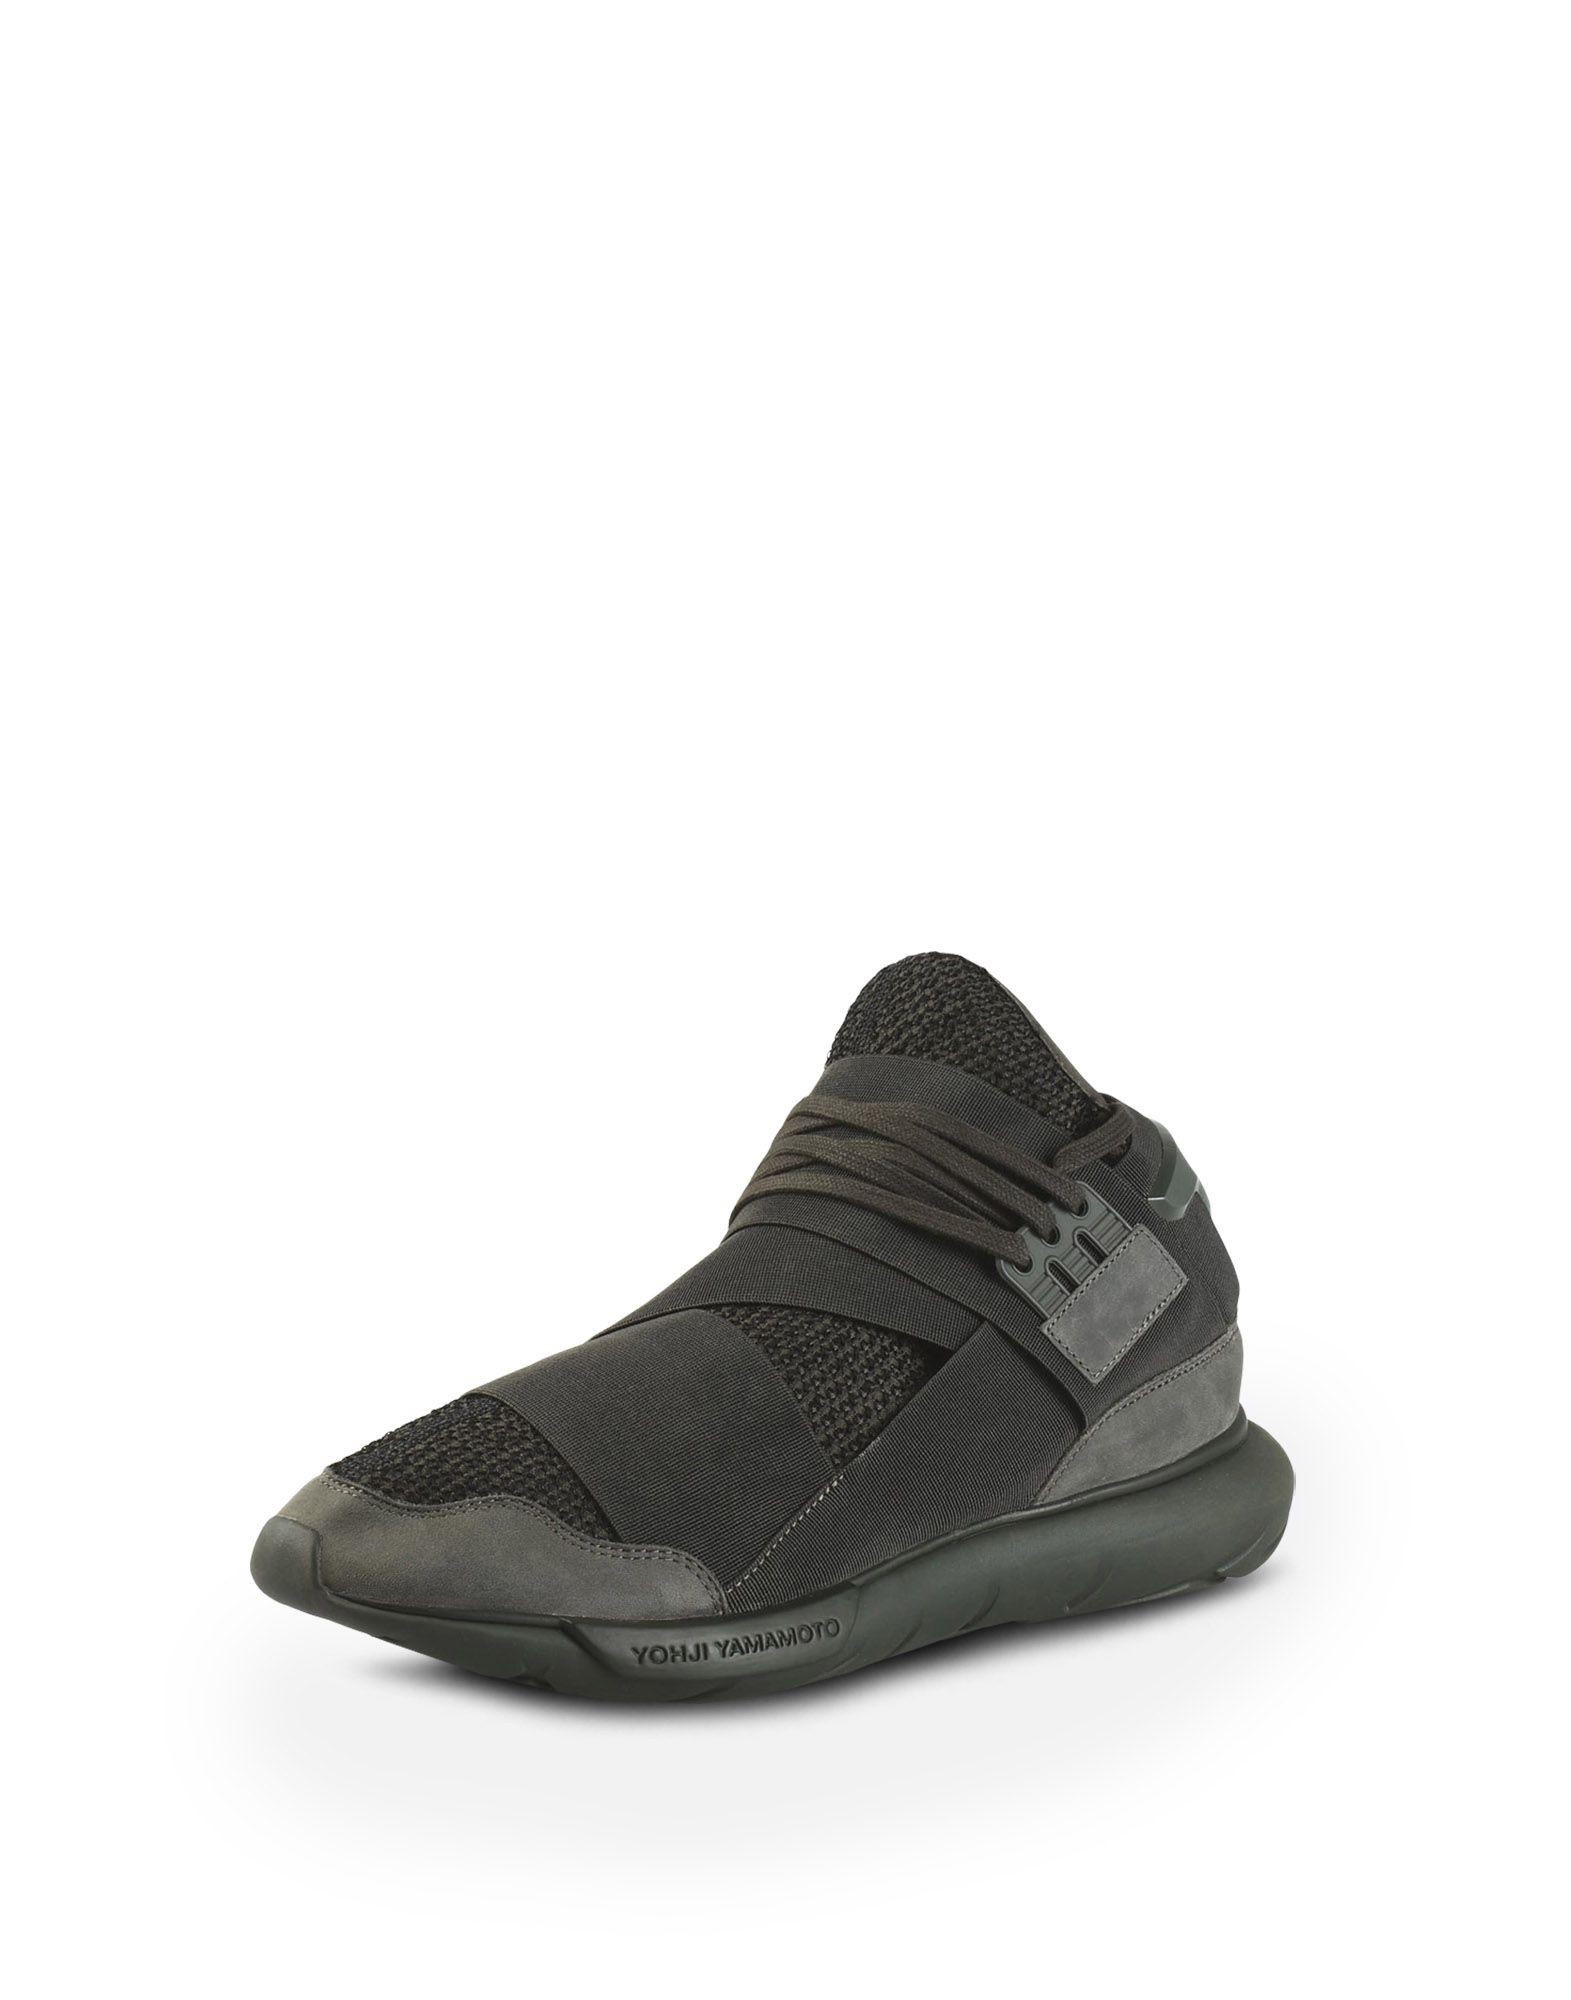 03e5d1deafa ... Y-3 Y-3 QASA HIGH Sneakers Man r ...